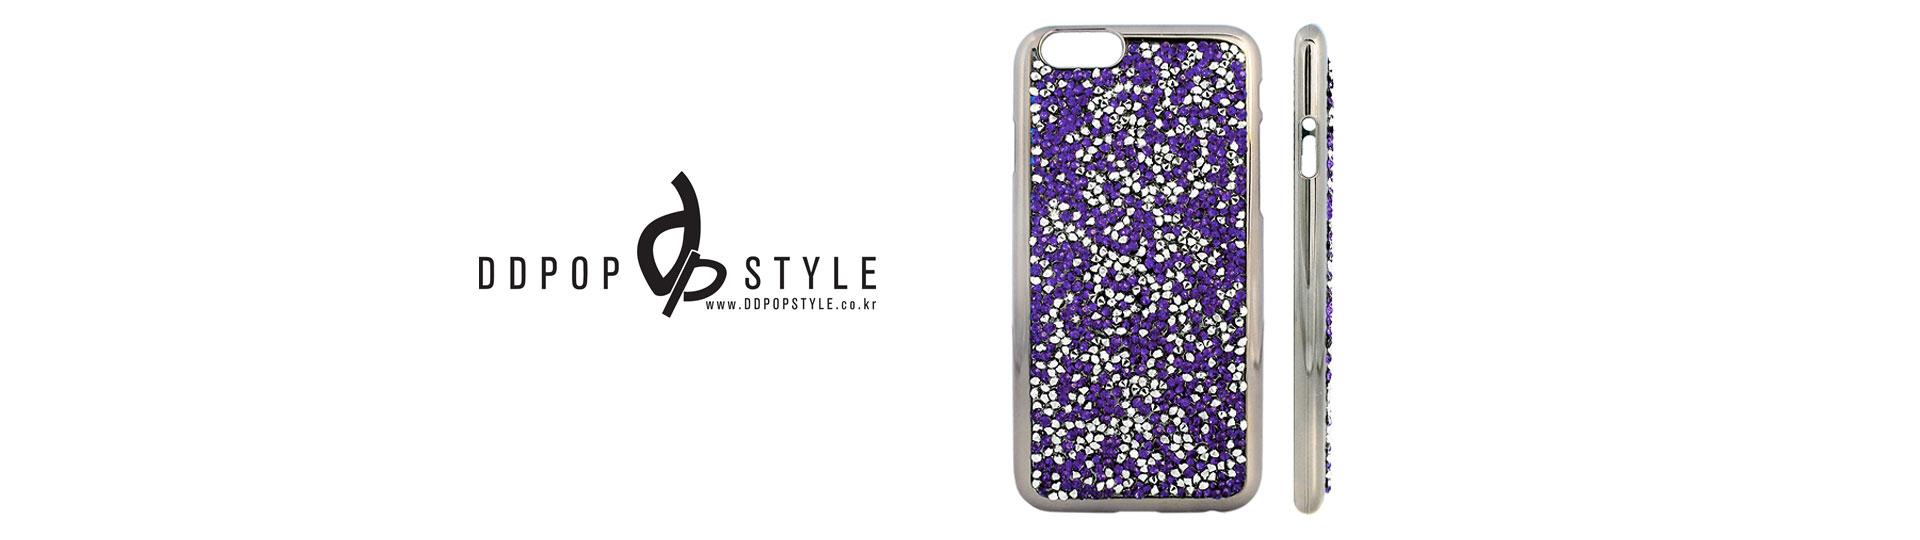 reputable site 2fd3e f829b Violet Phone Cases - DDPOPSTYLE